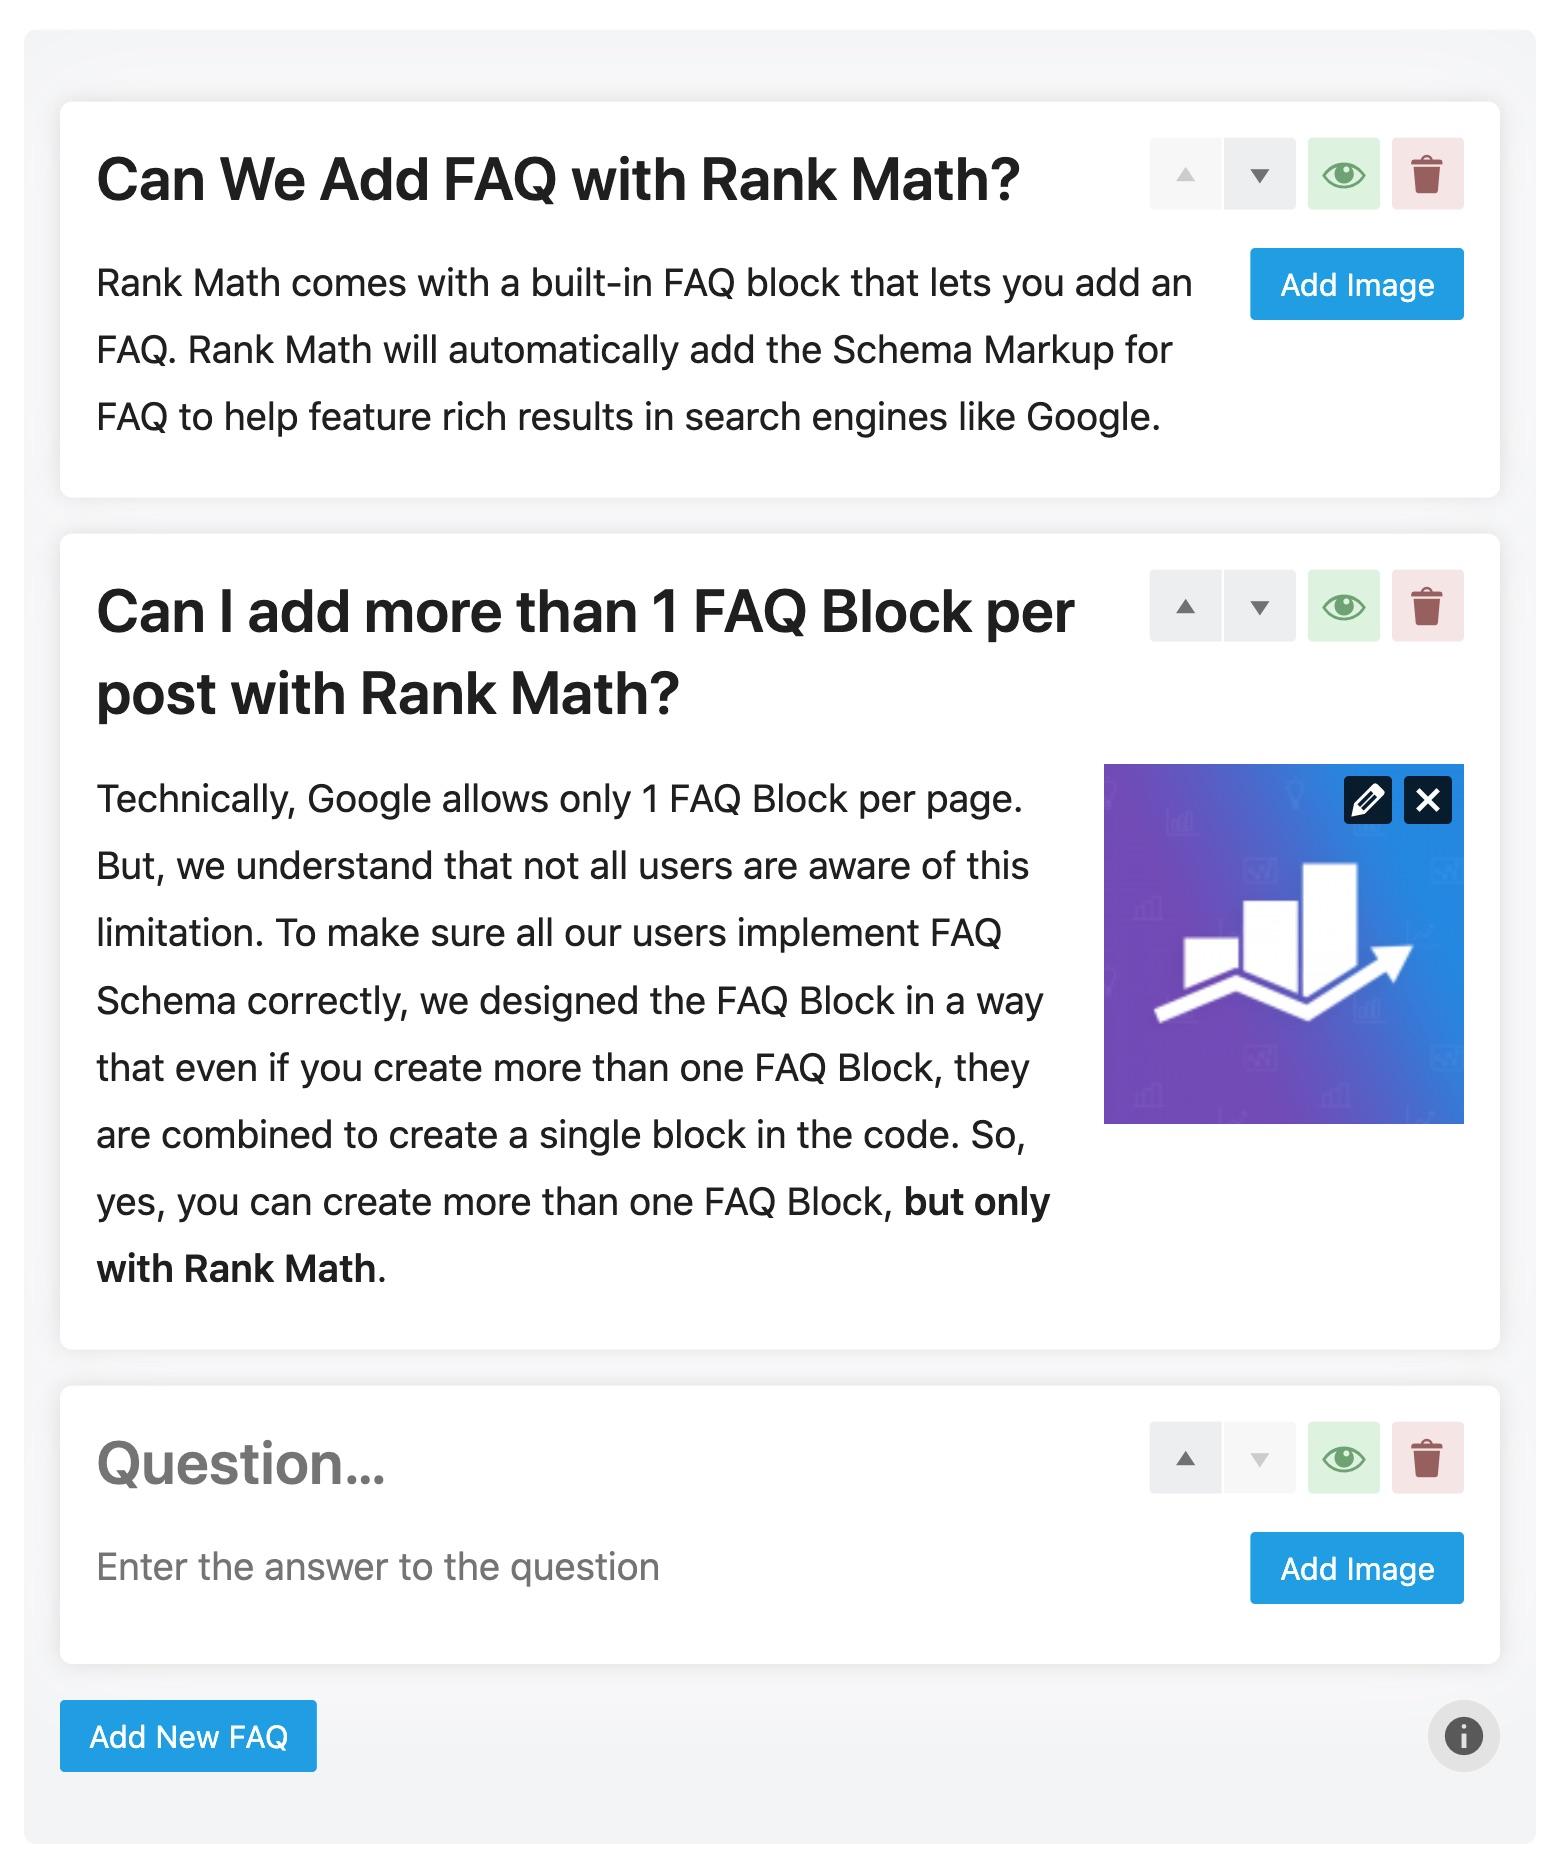 Rank Math FAQ block example